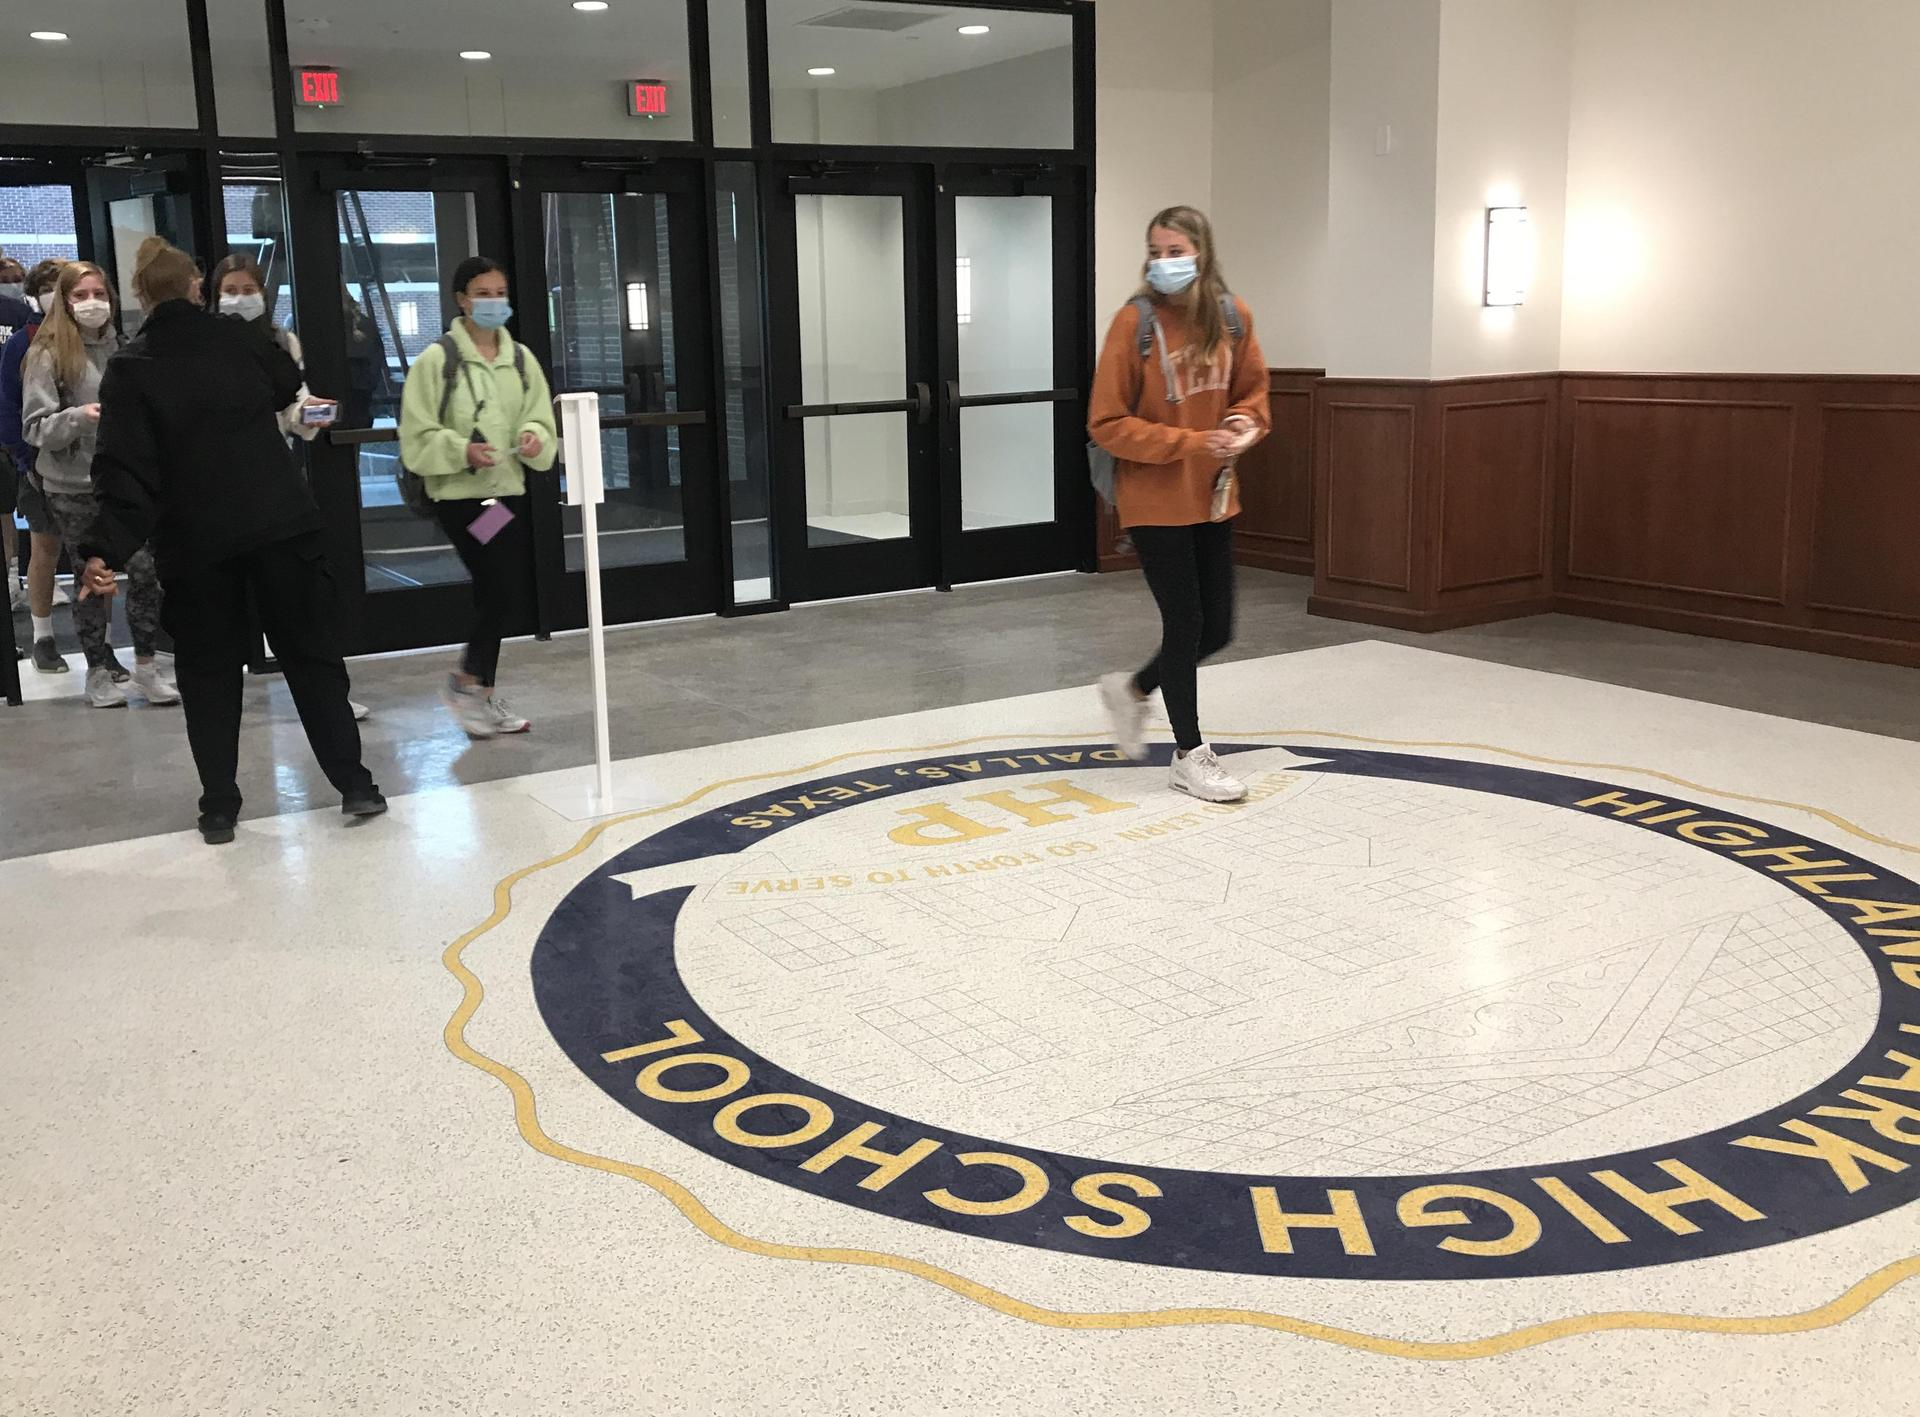 HPHS students enter new doors